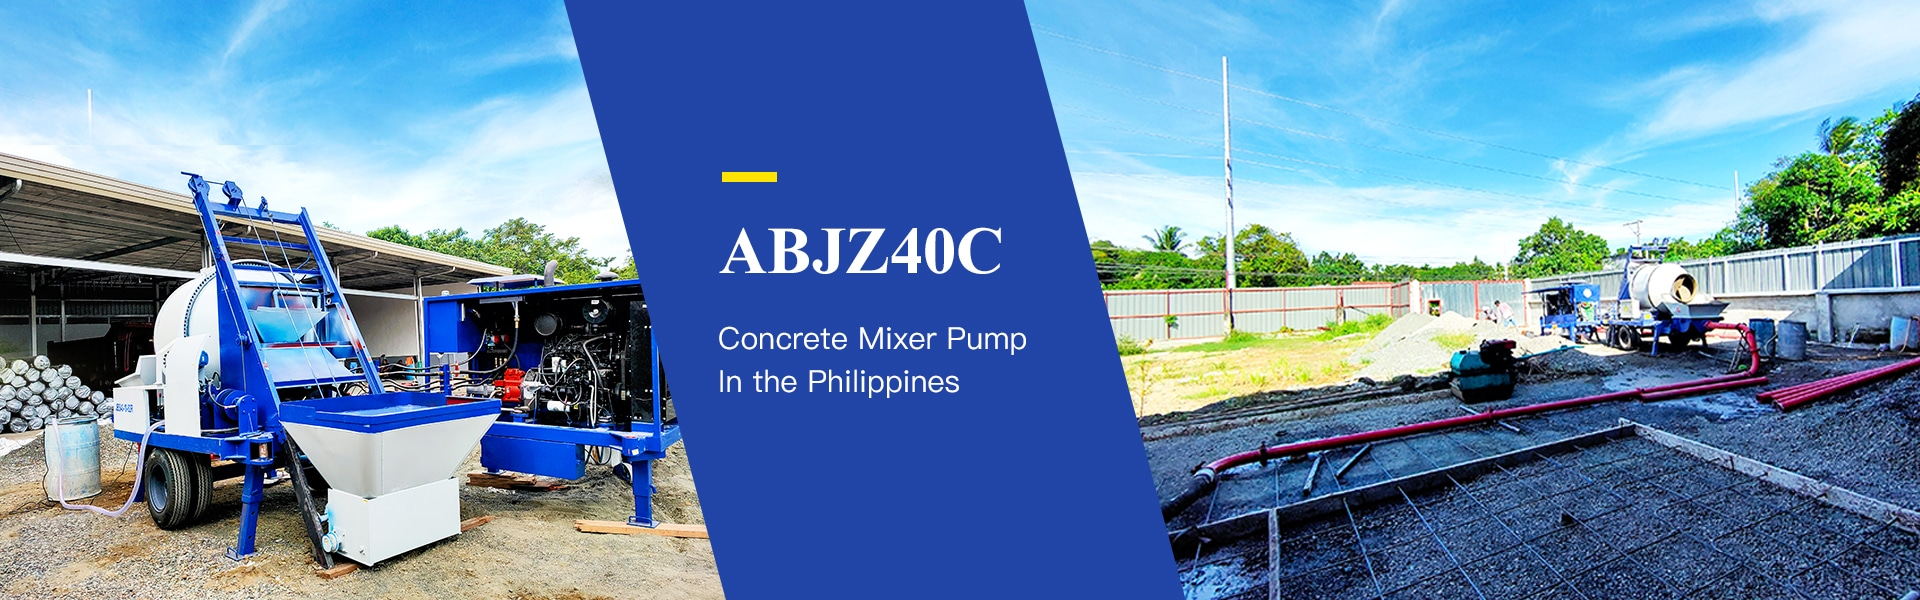 ABJZ40C Concrete Mixer Pump Philippines